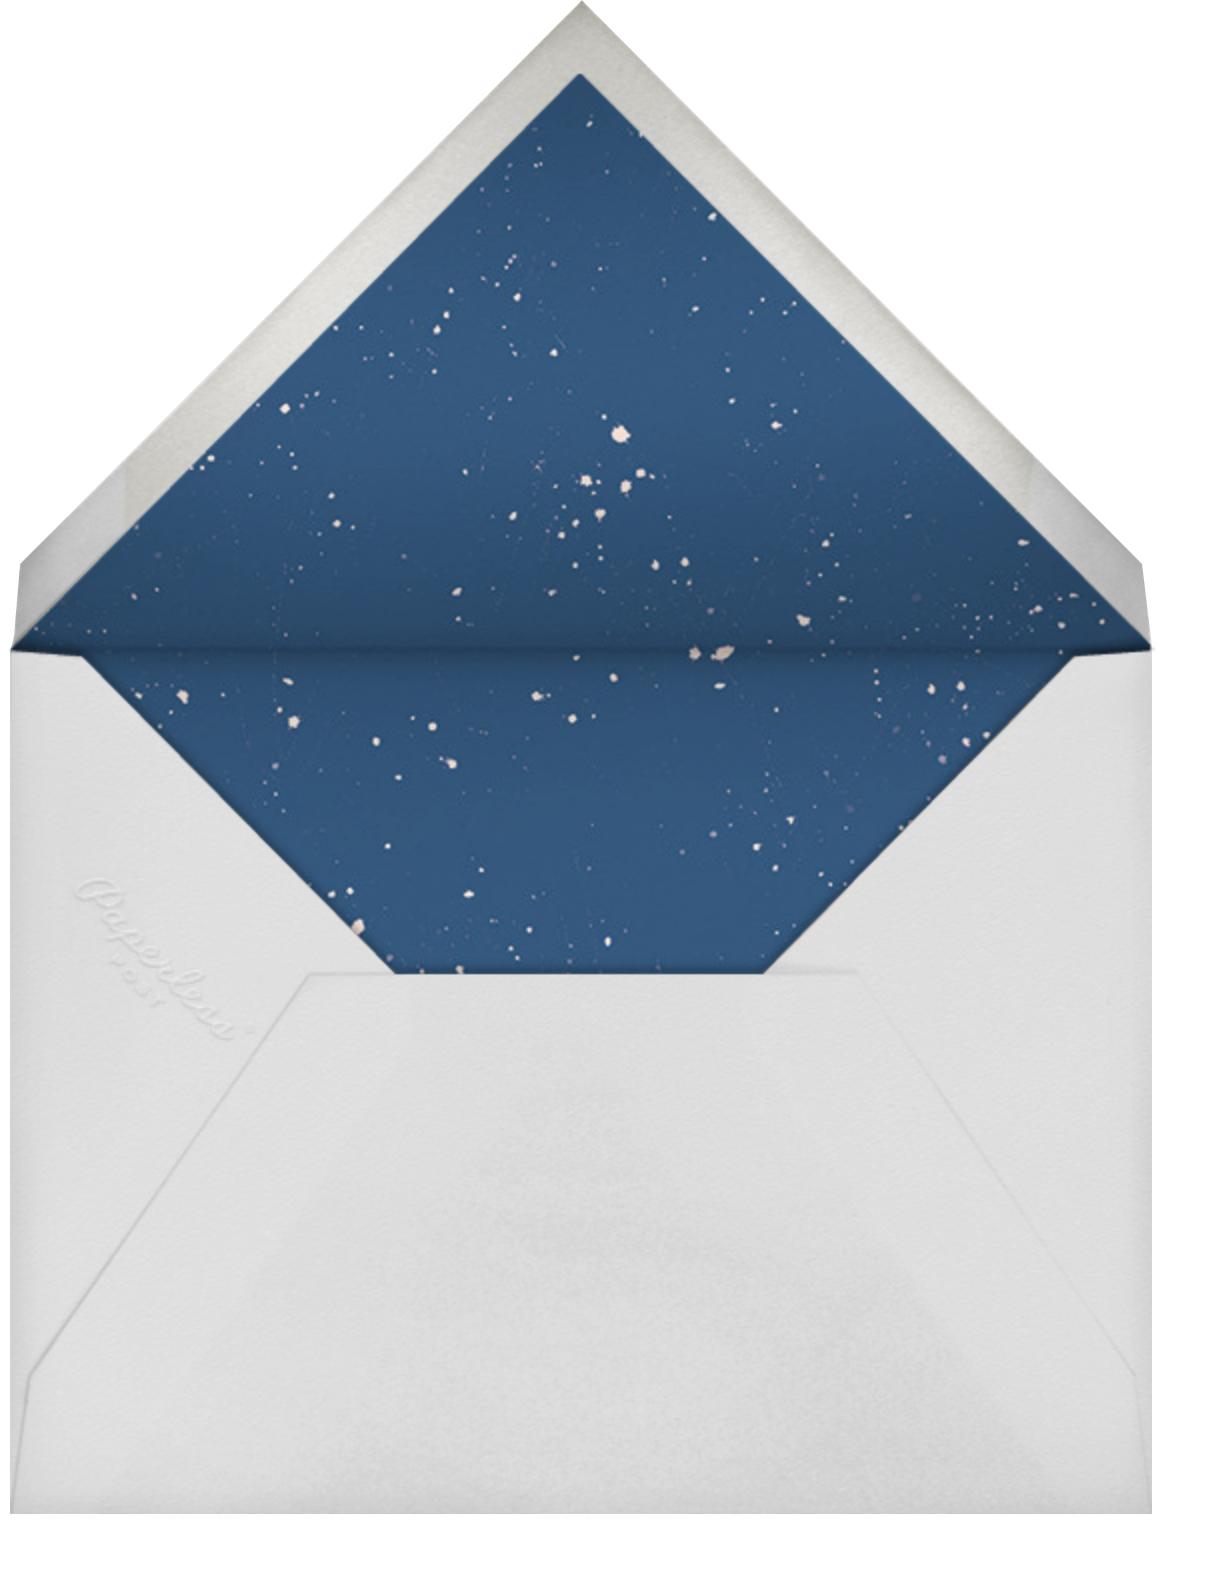 Johanna Photo - Meringue - Paperless Post - Photo  - envelope back